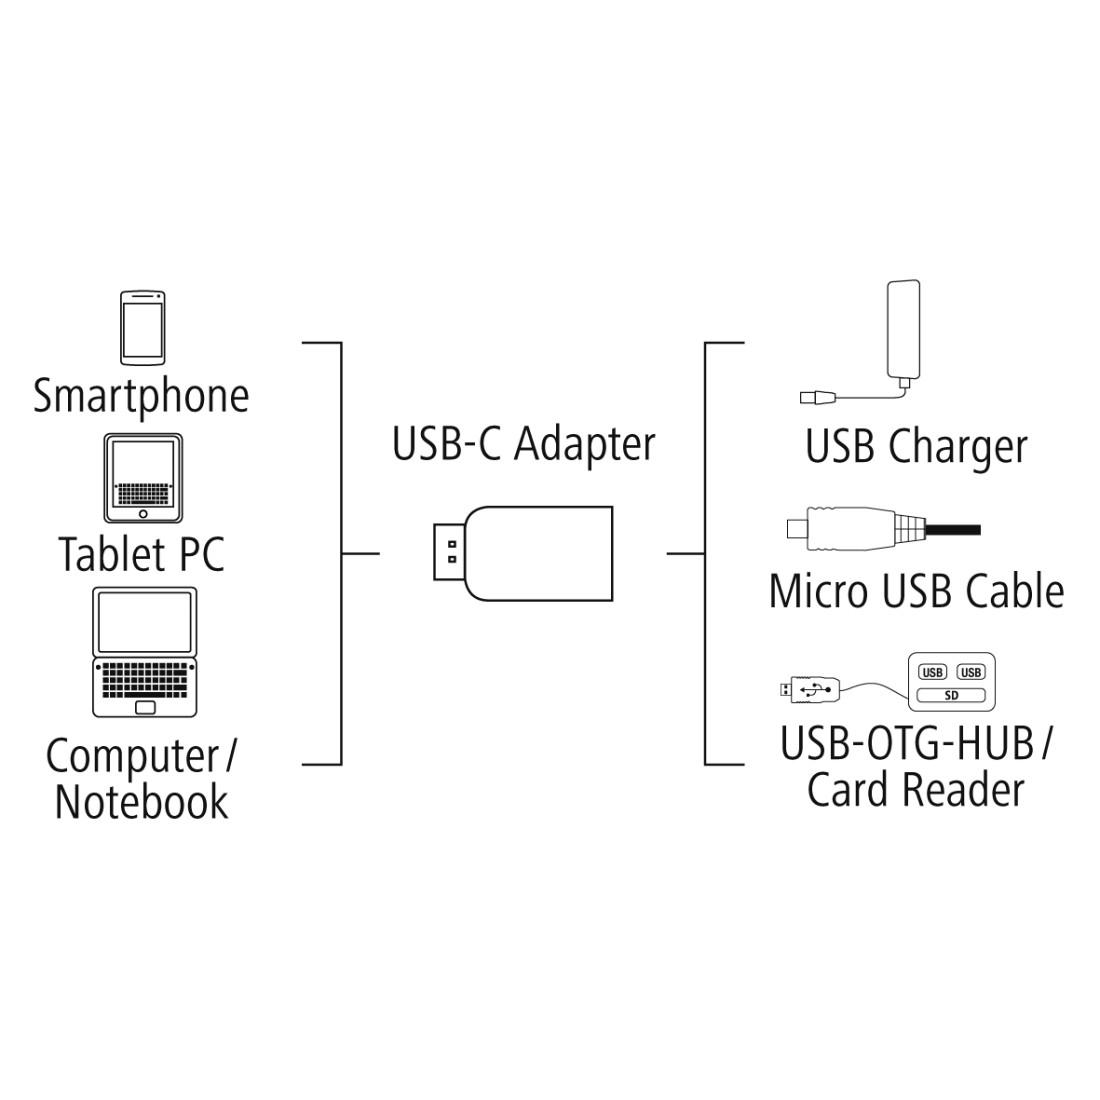 hight resolution of stx high res line drawing hama usb c adapter usb 2 0